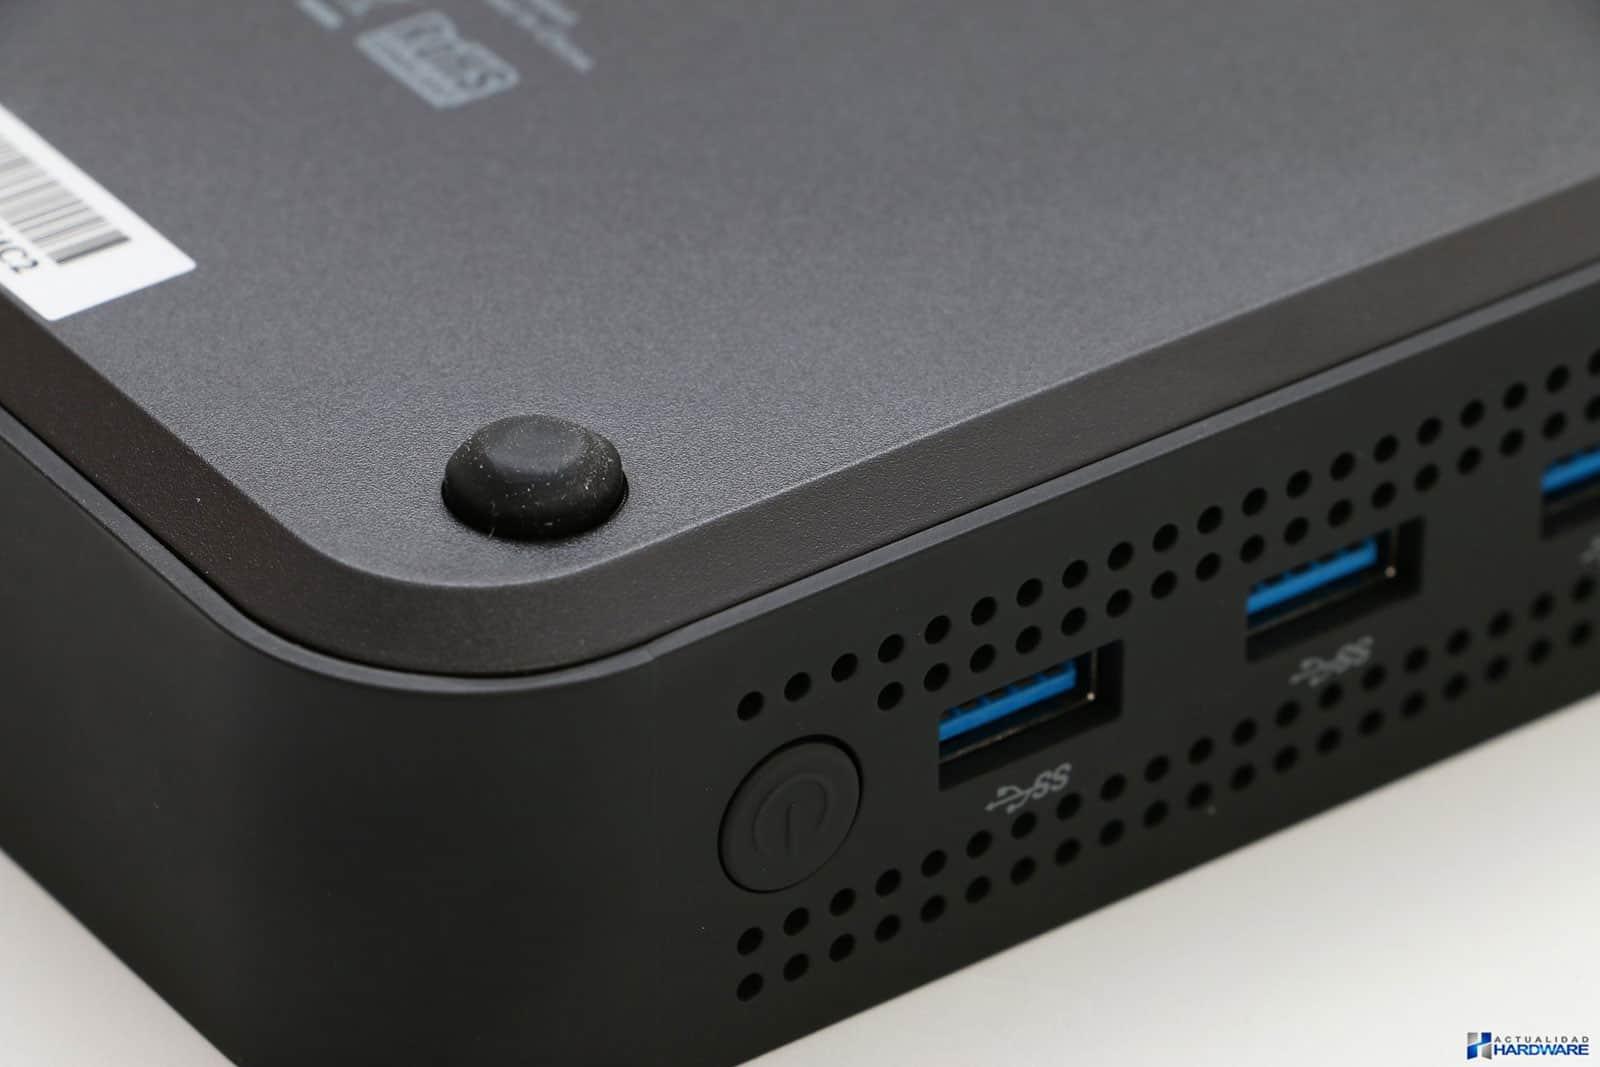 Minix Neo N42C-4: Bottom